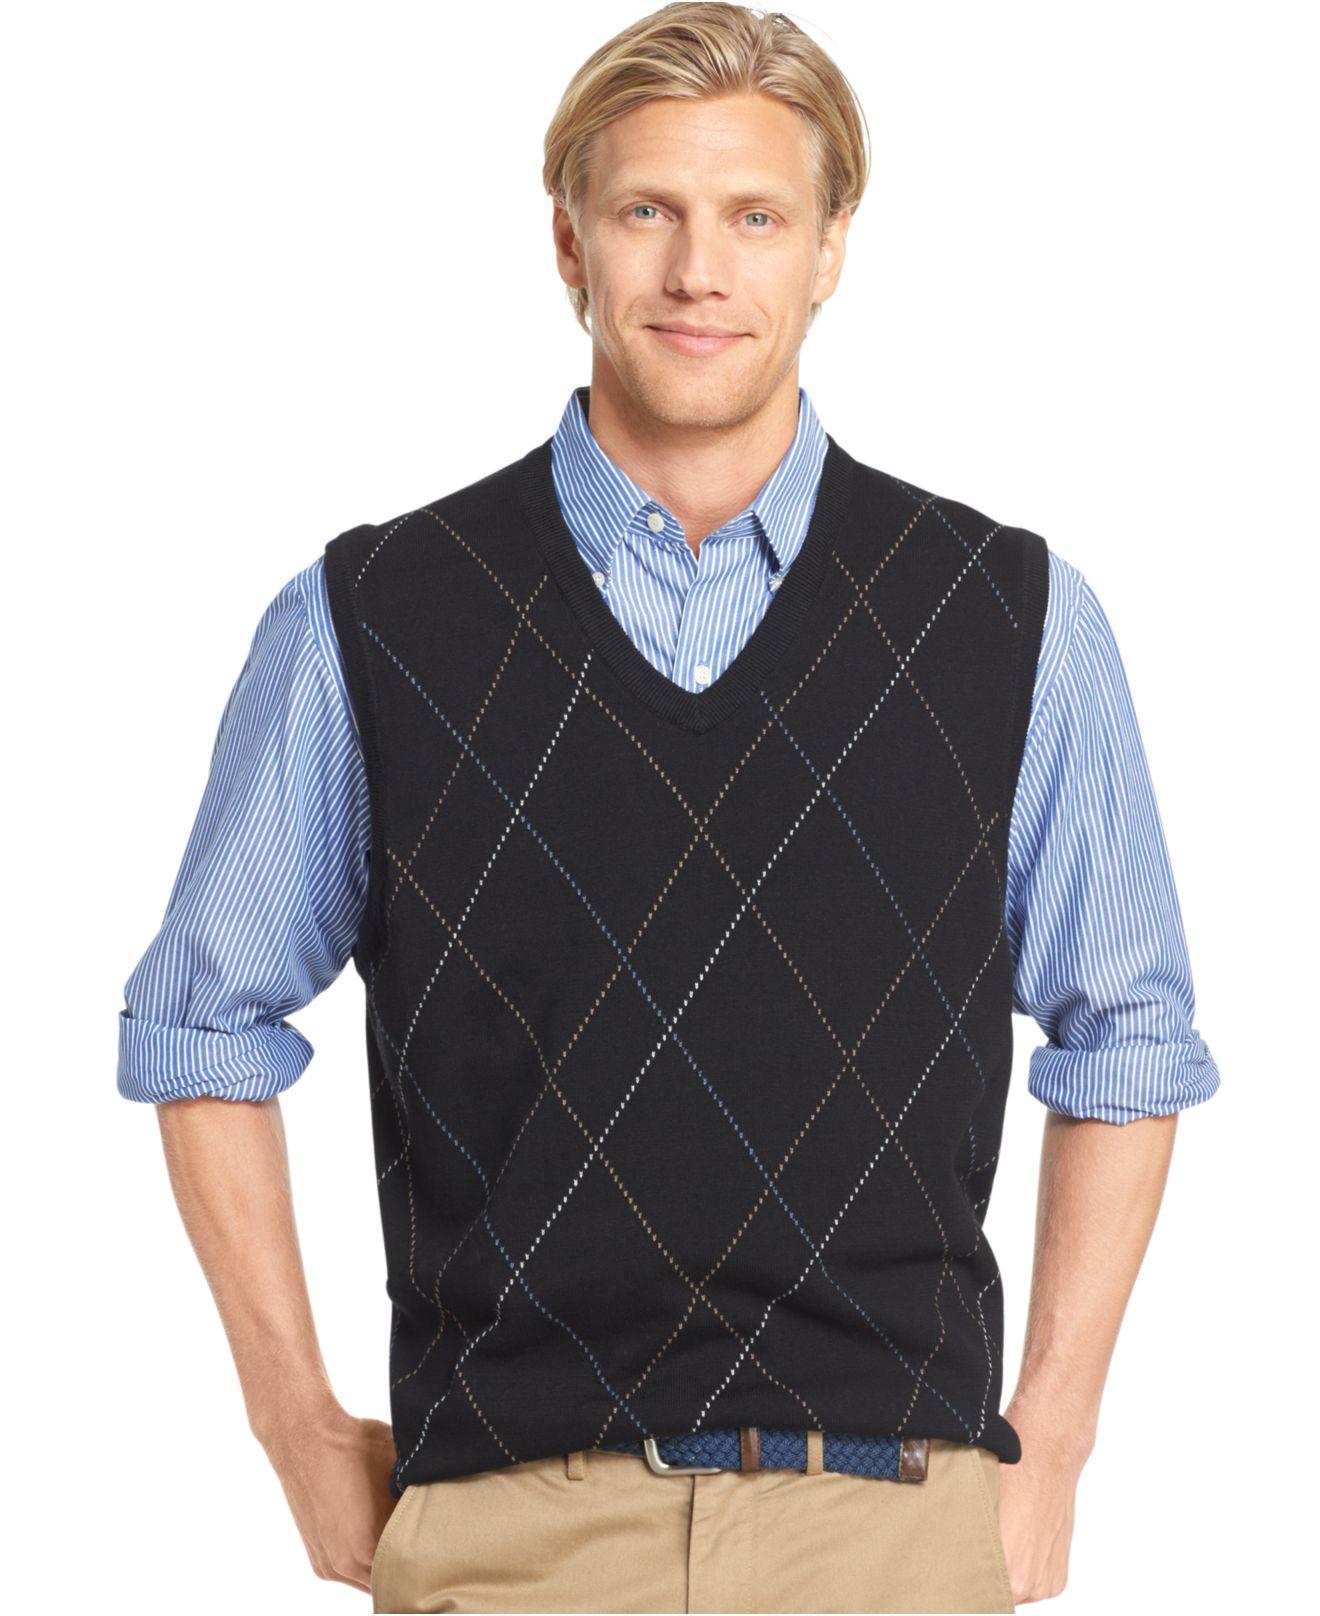 Black Sweater Vest Men 103